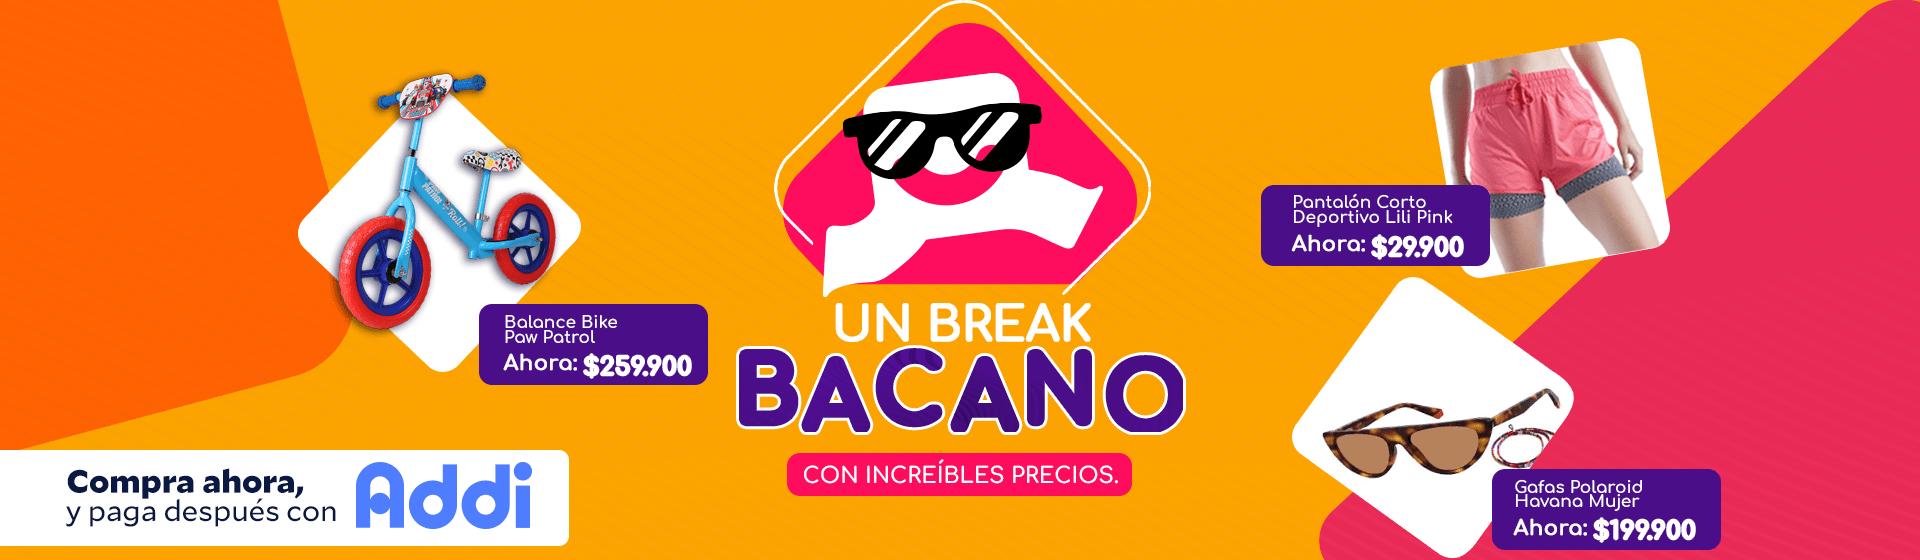 Break Bacano